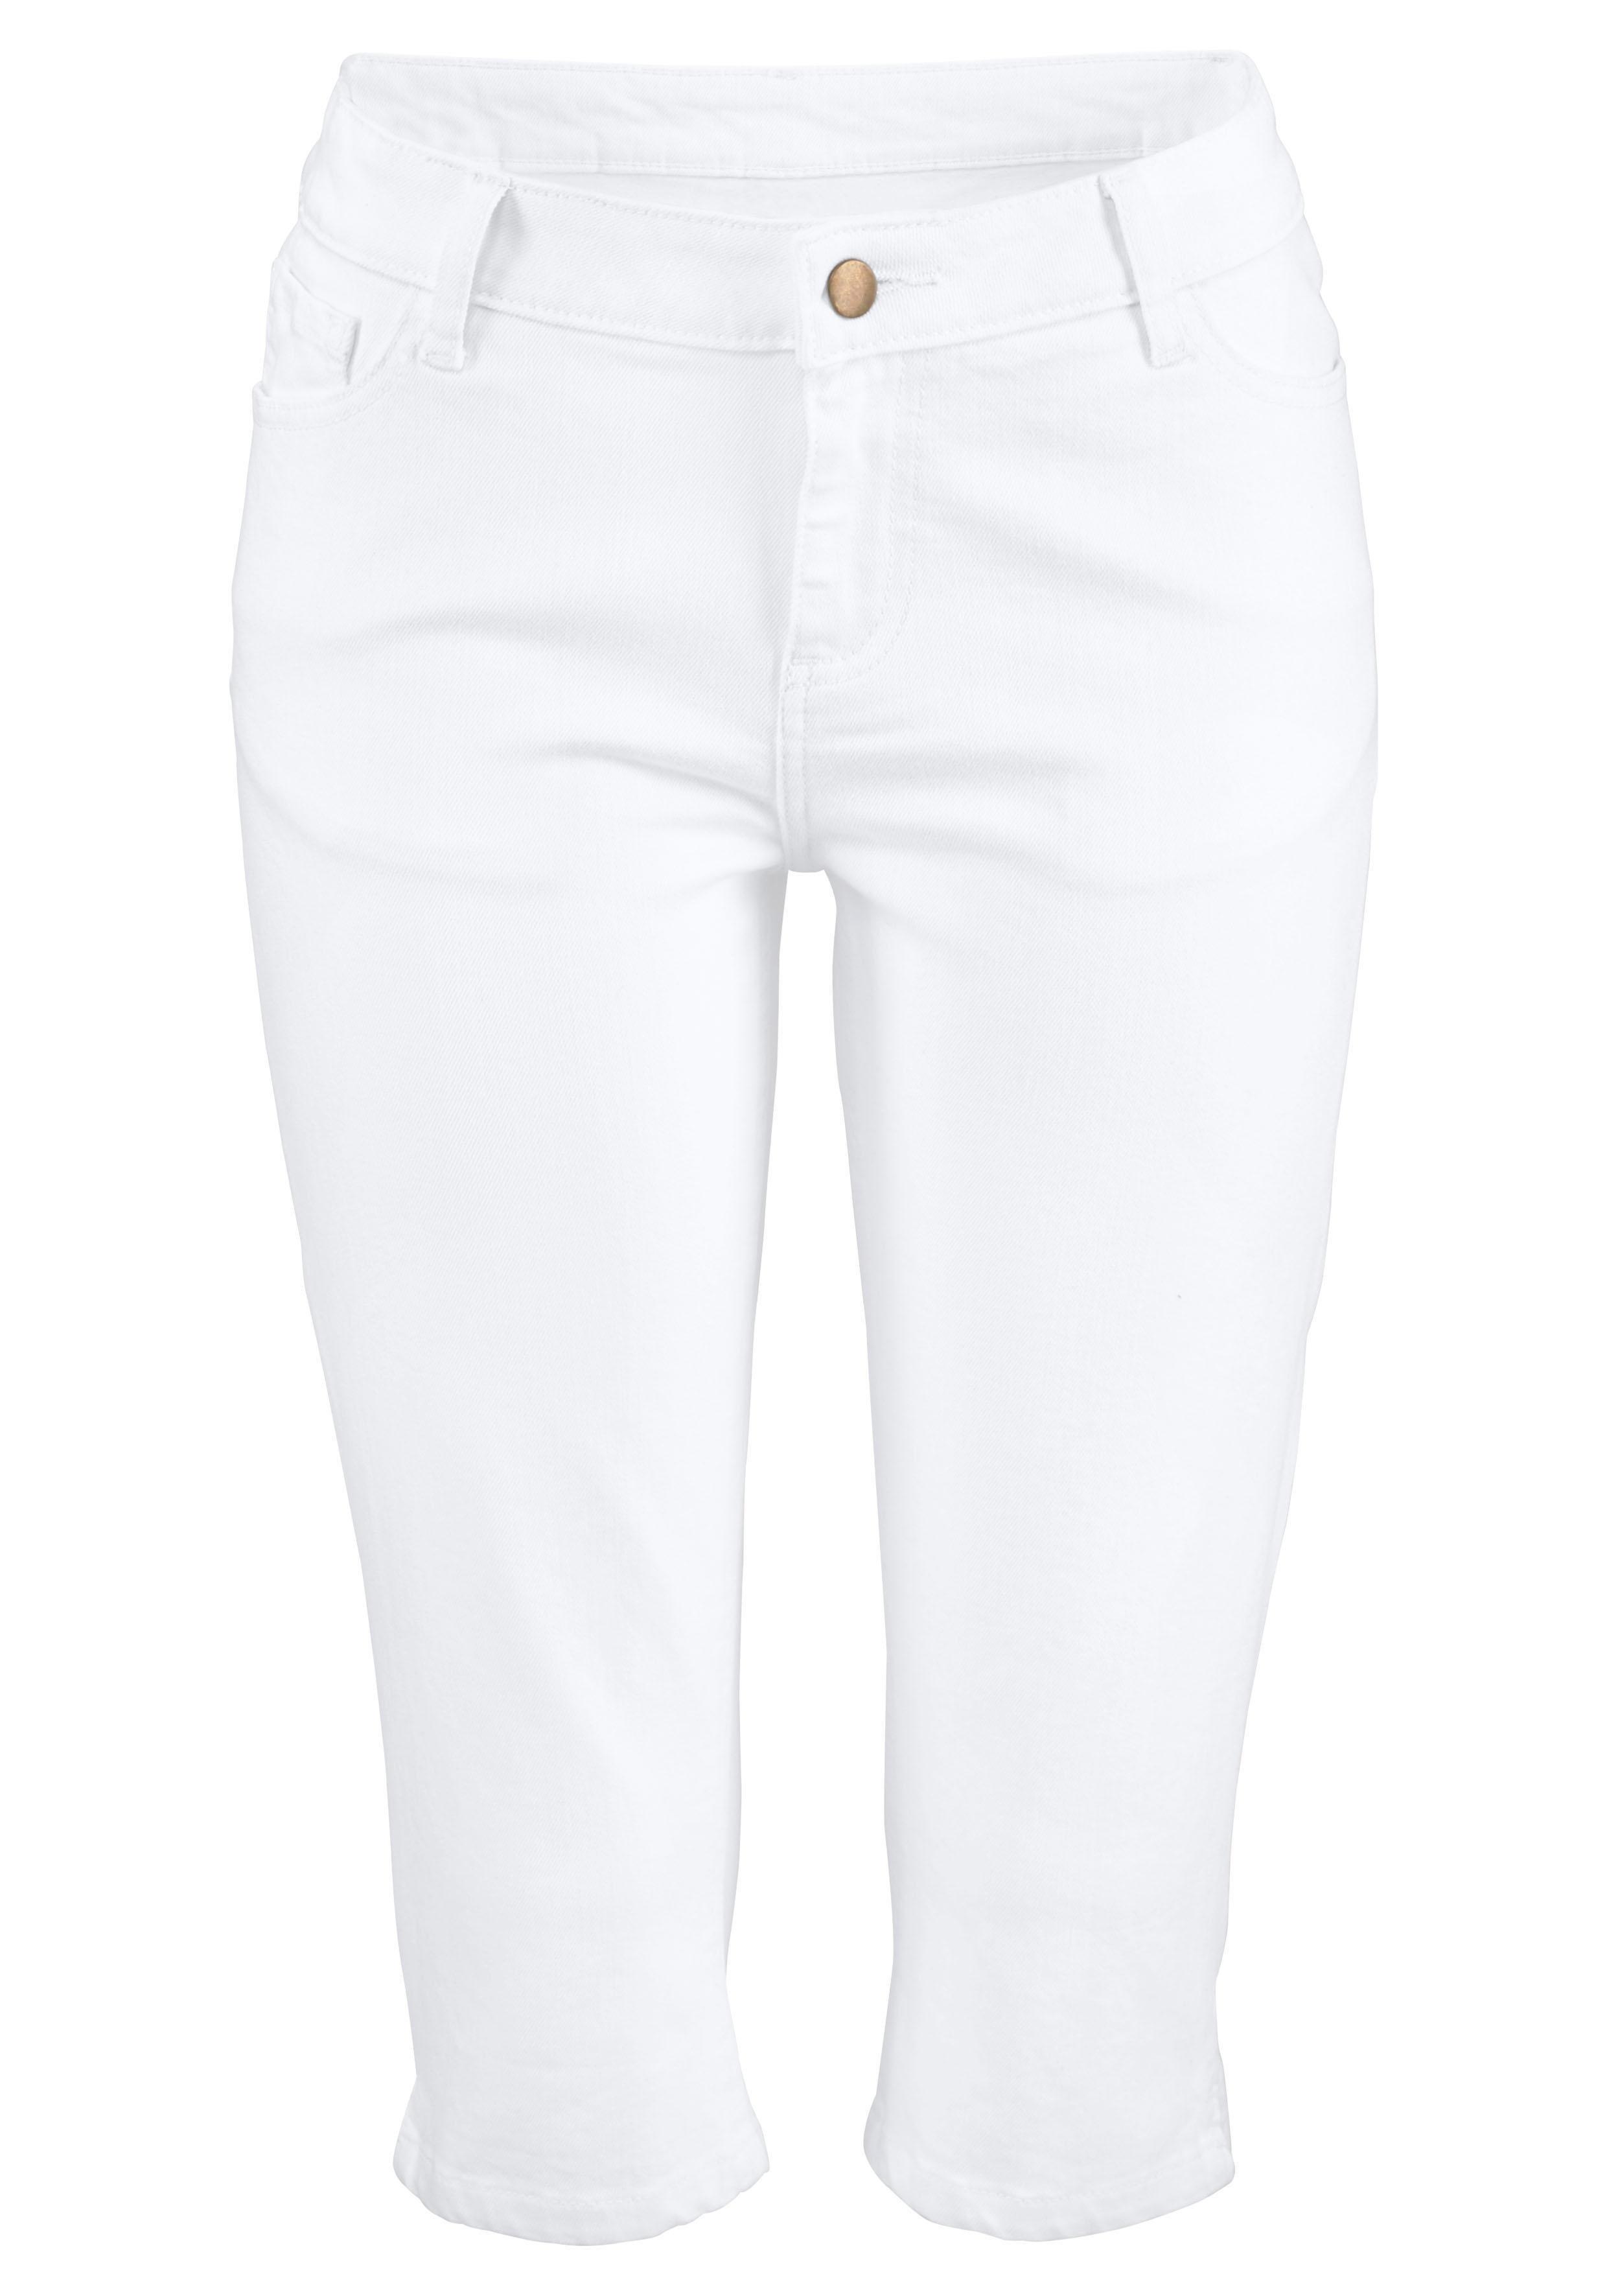 Beachtime 7/8-capri jeans online kopen op lascana.nl